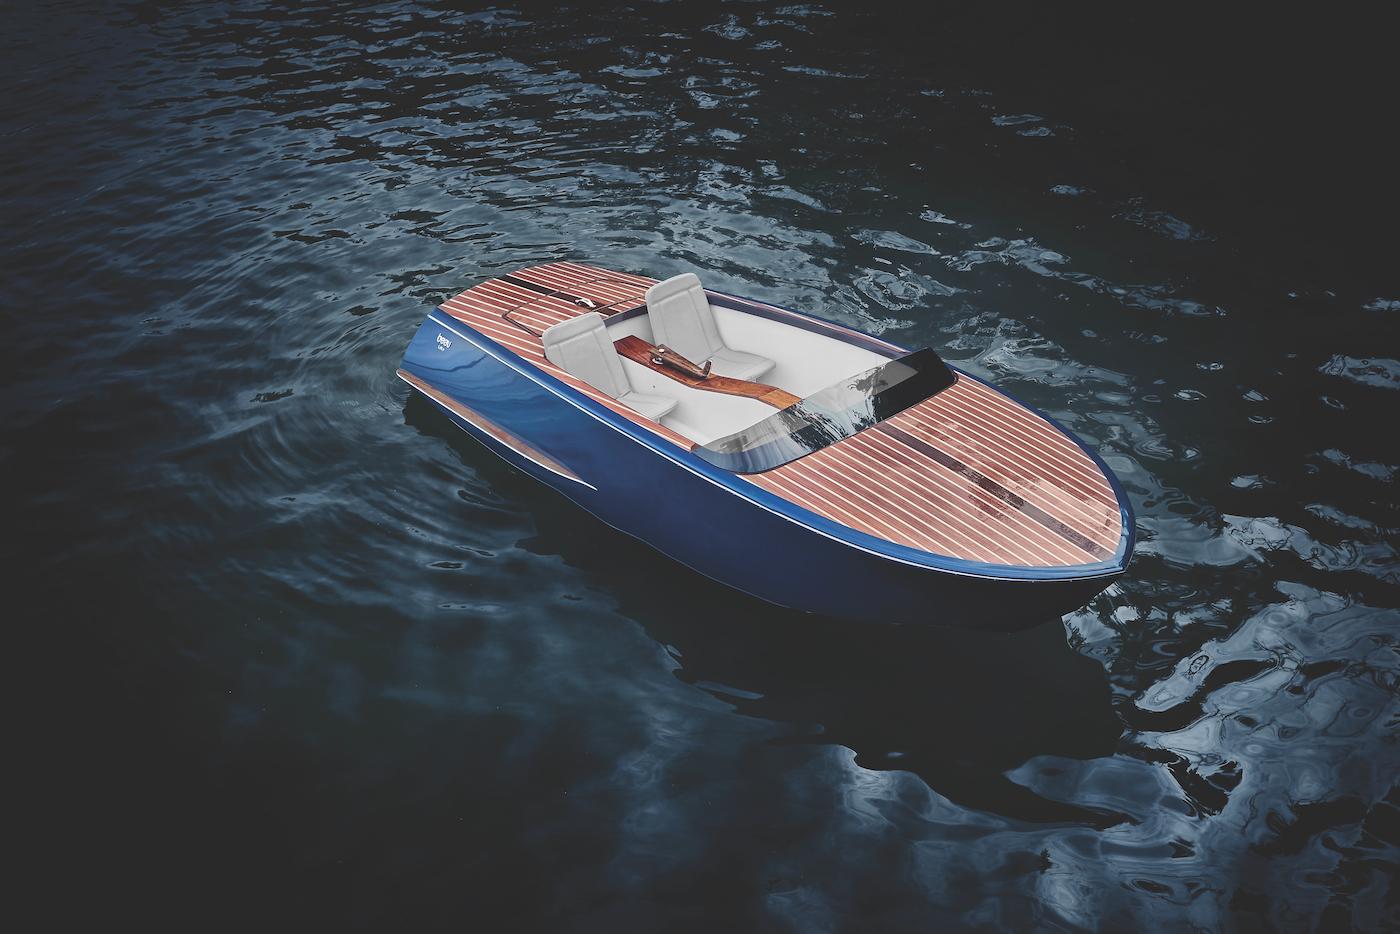 Exclusive pedal boat by Beau Lake - Photo credit Beau Lake